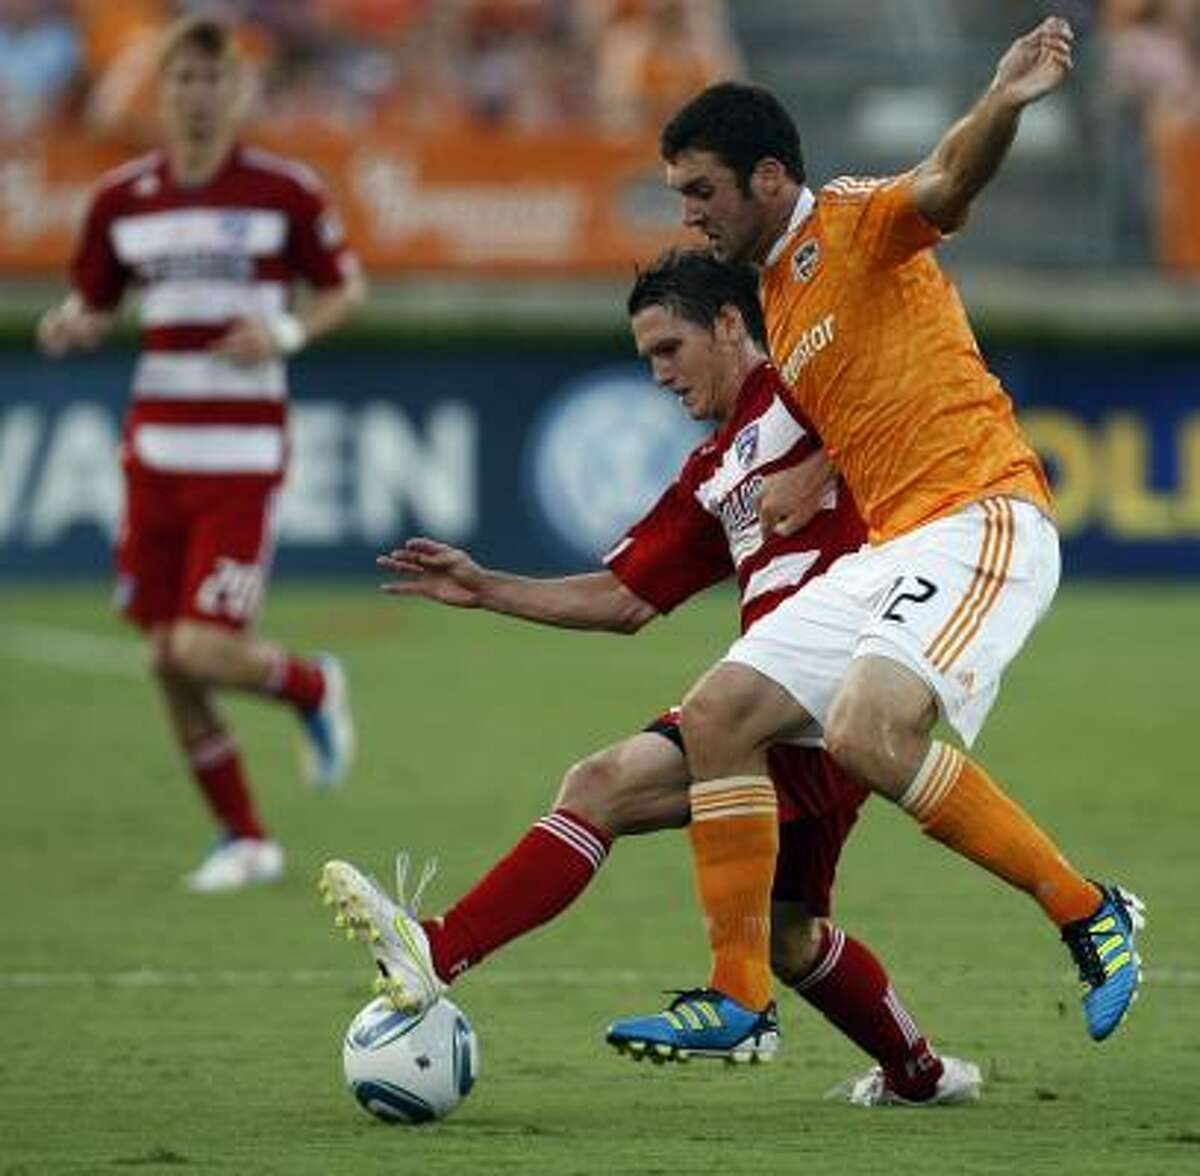 Dynamo forward Will Bruin (12) and FC Dallas defender Zach Loyd (19) battle for the ball.